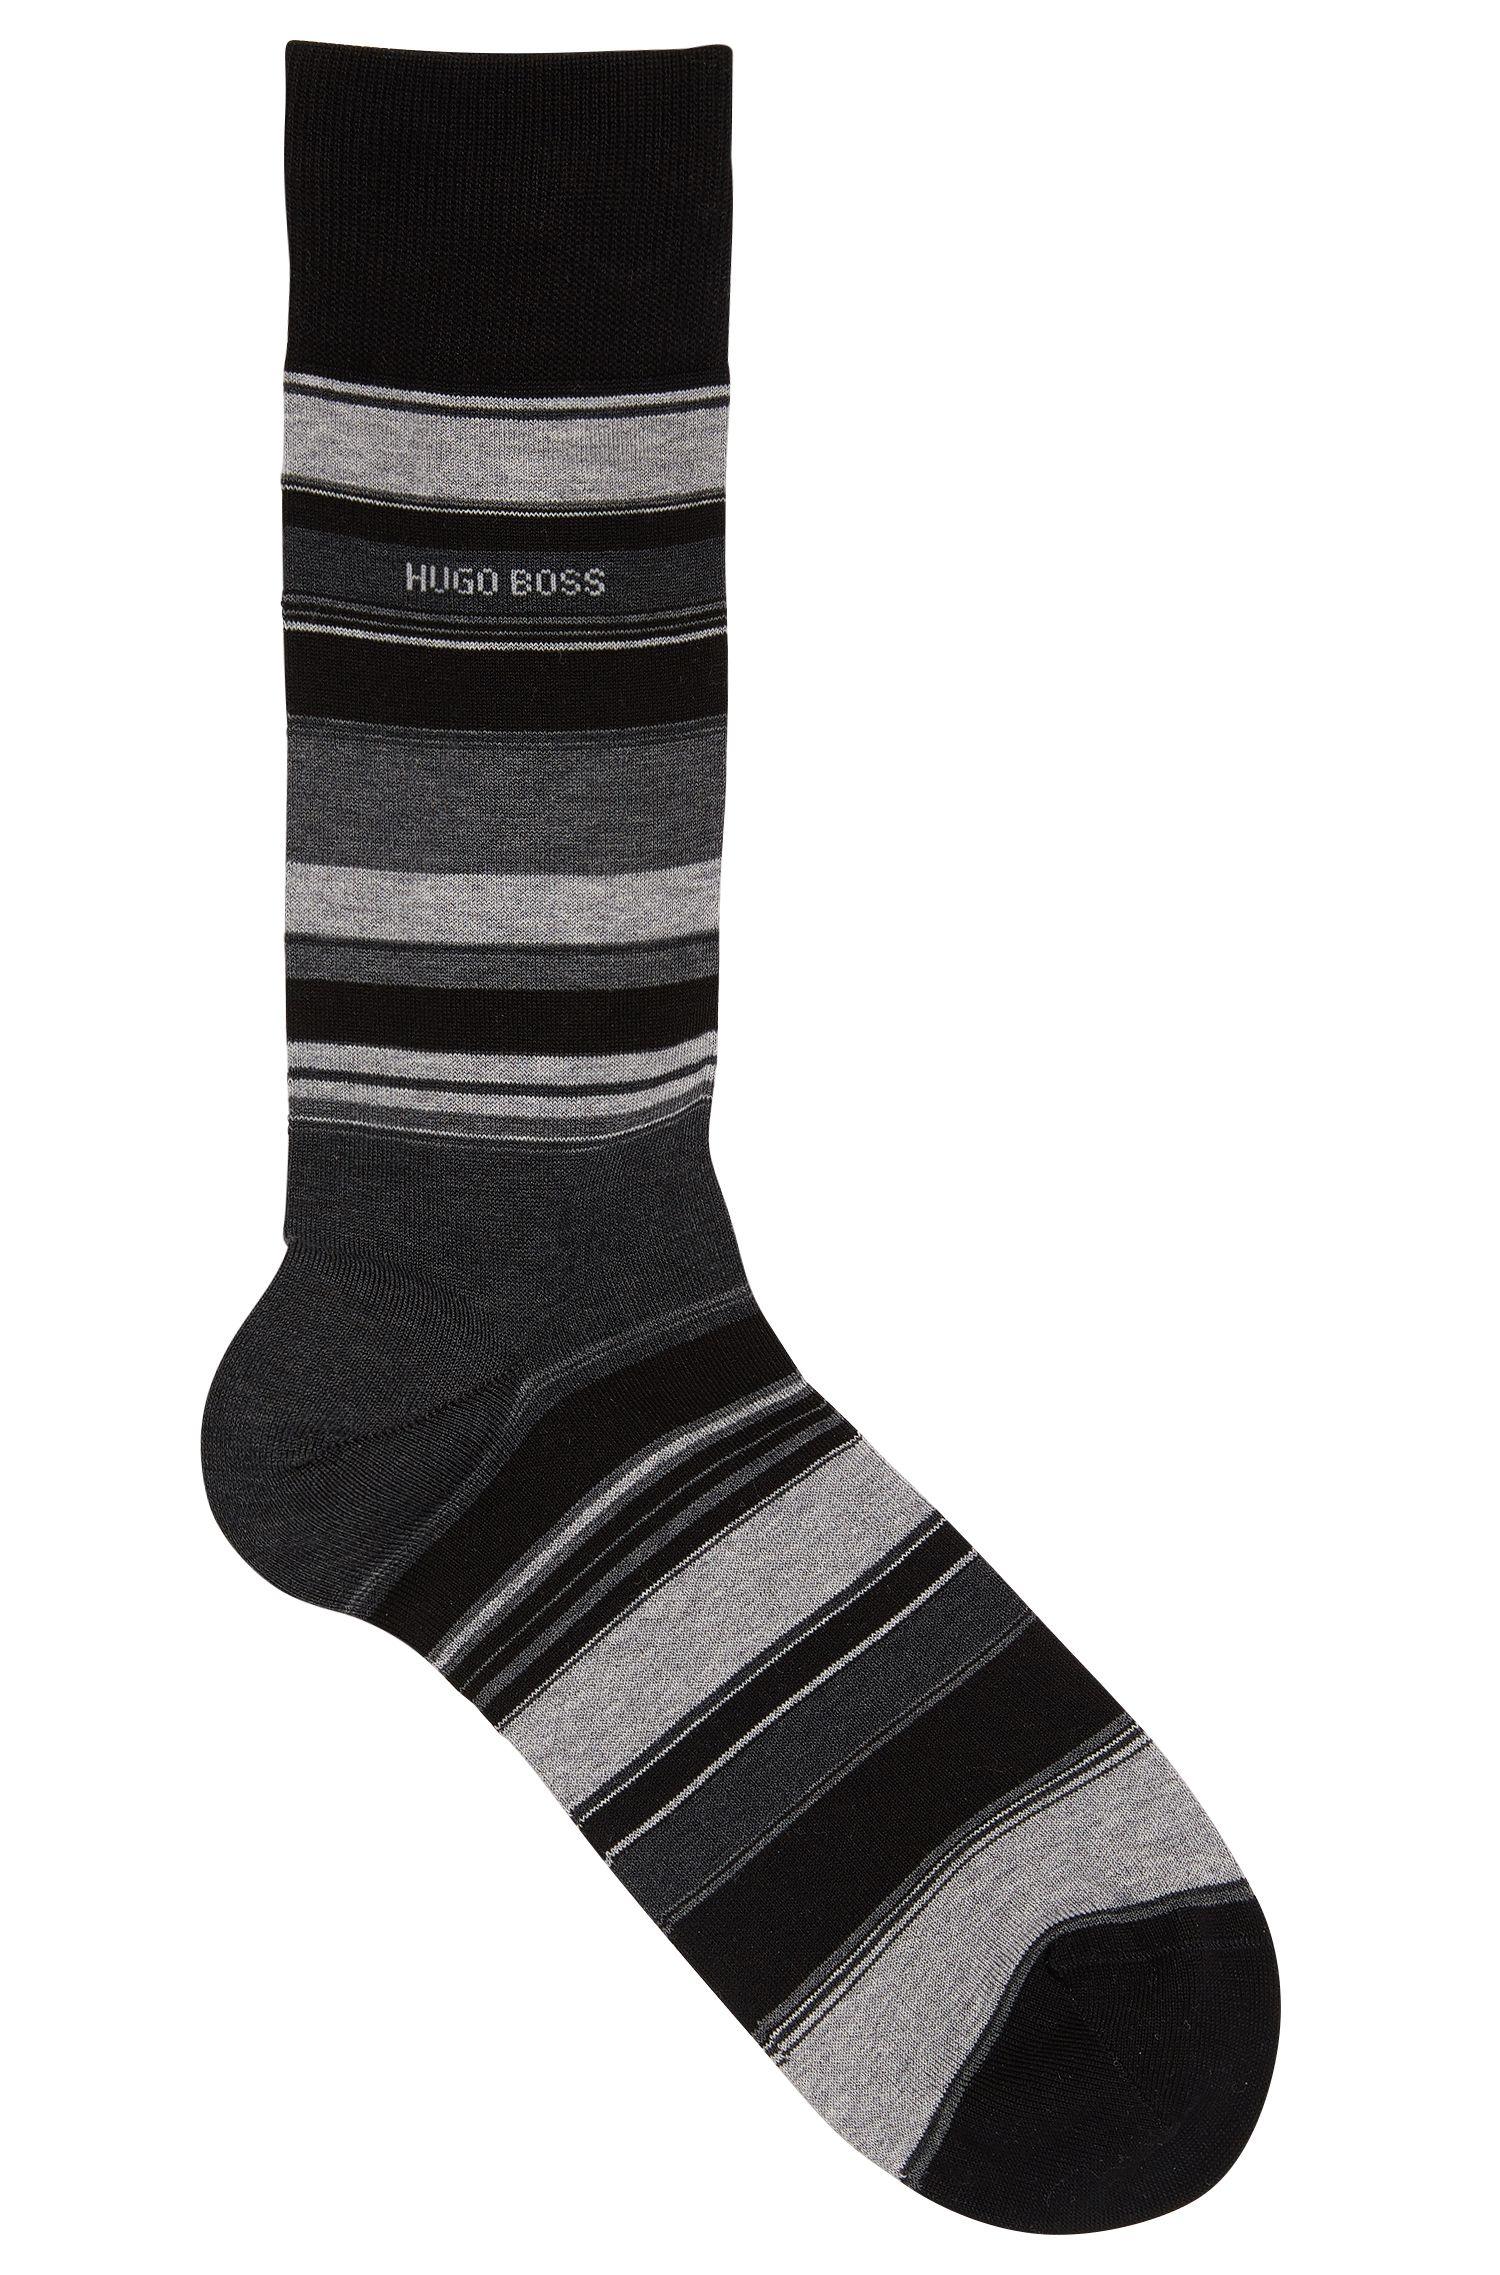 Striped socks in mercerised cotton blend